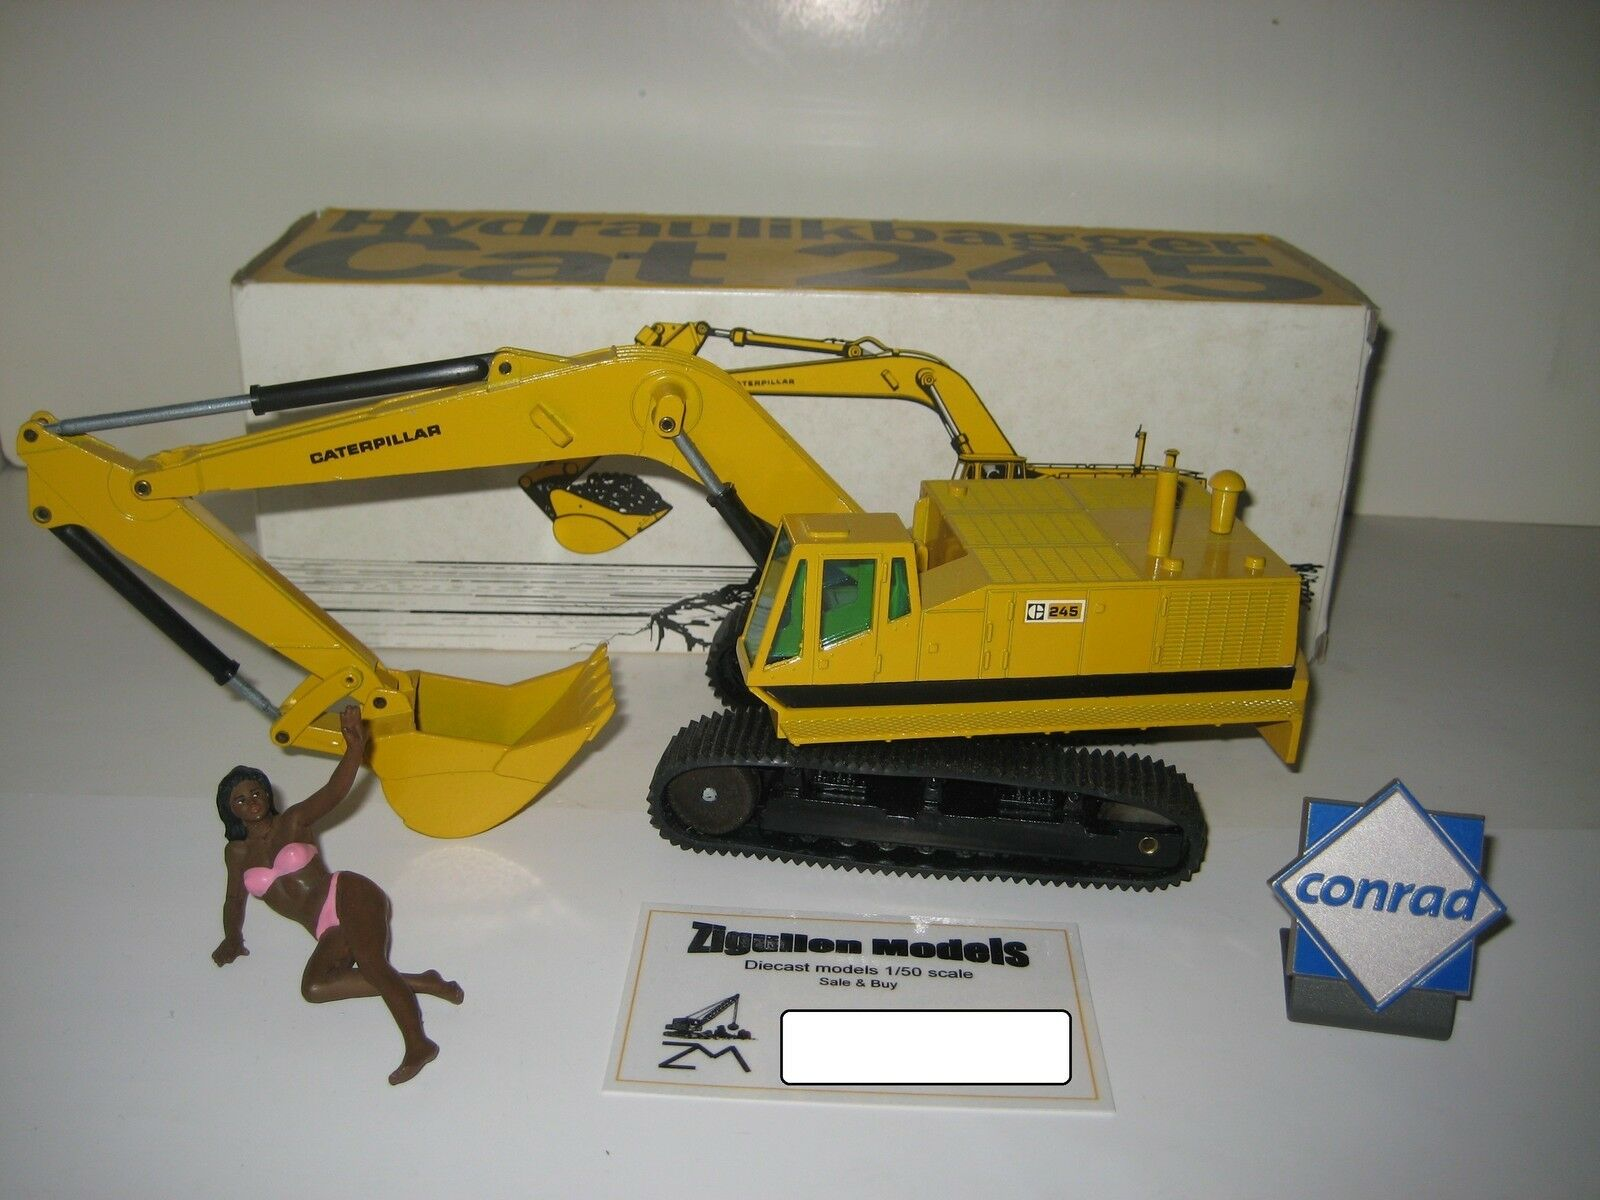 Caterpillar 245 Excavateurs tieflöffel PacMan logo  160.1 NZG 1 50 neuf dans sa boîte